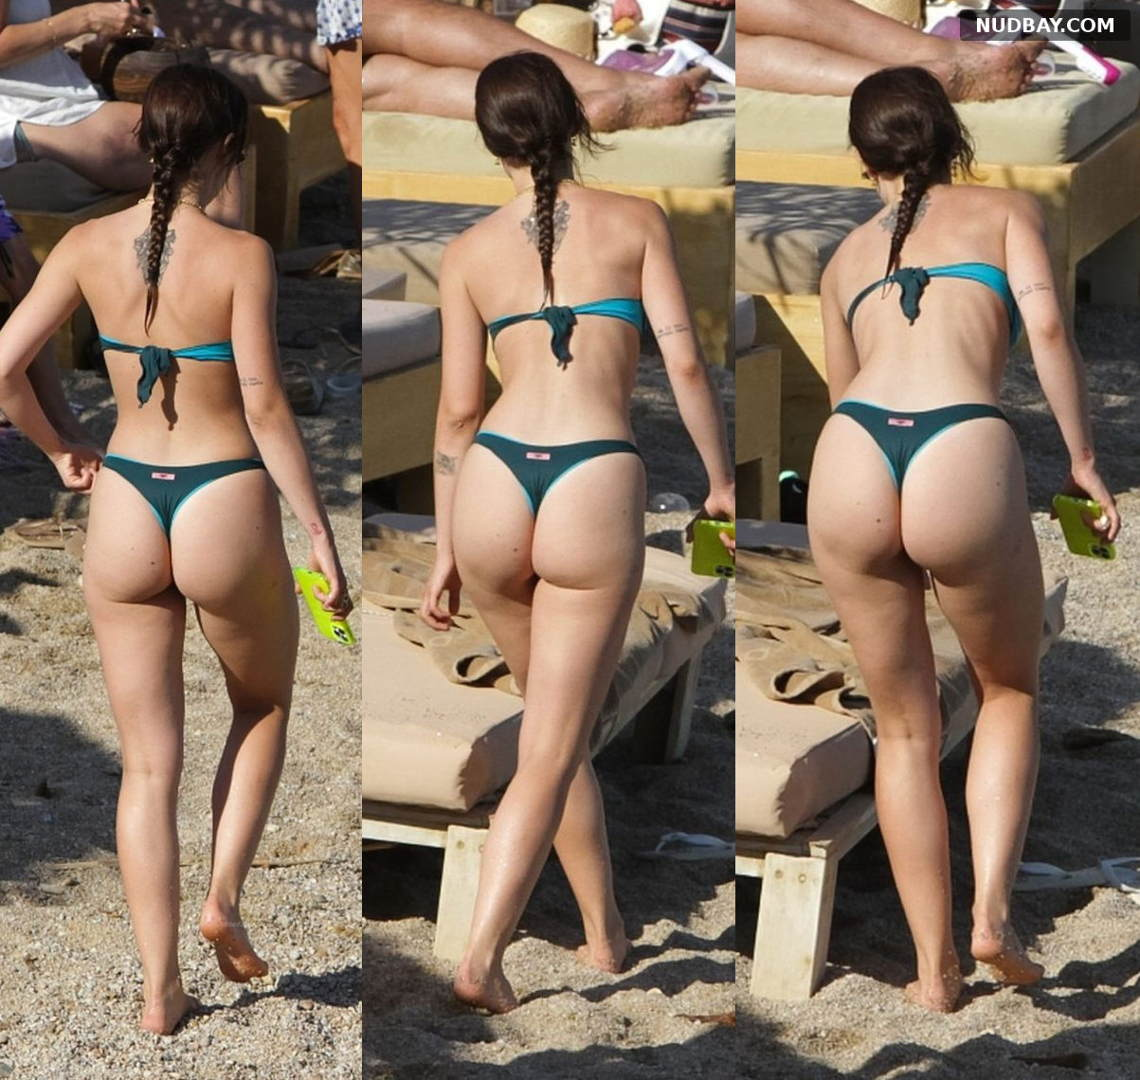 Aurora Ramazzotti Ass in a hot string bikini on the beach of Mykonos Aug 09 2021